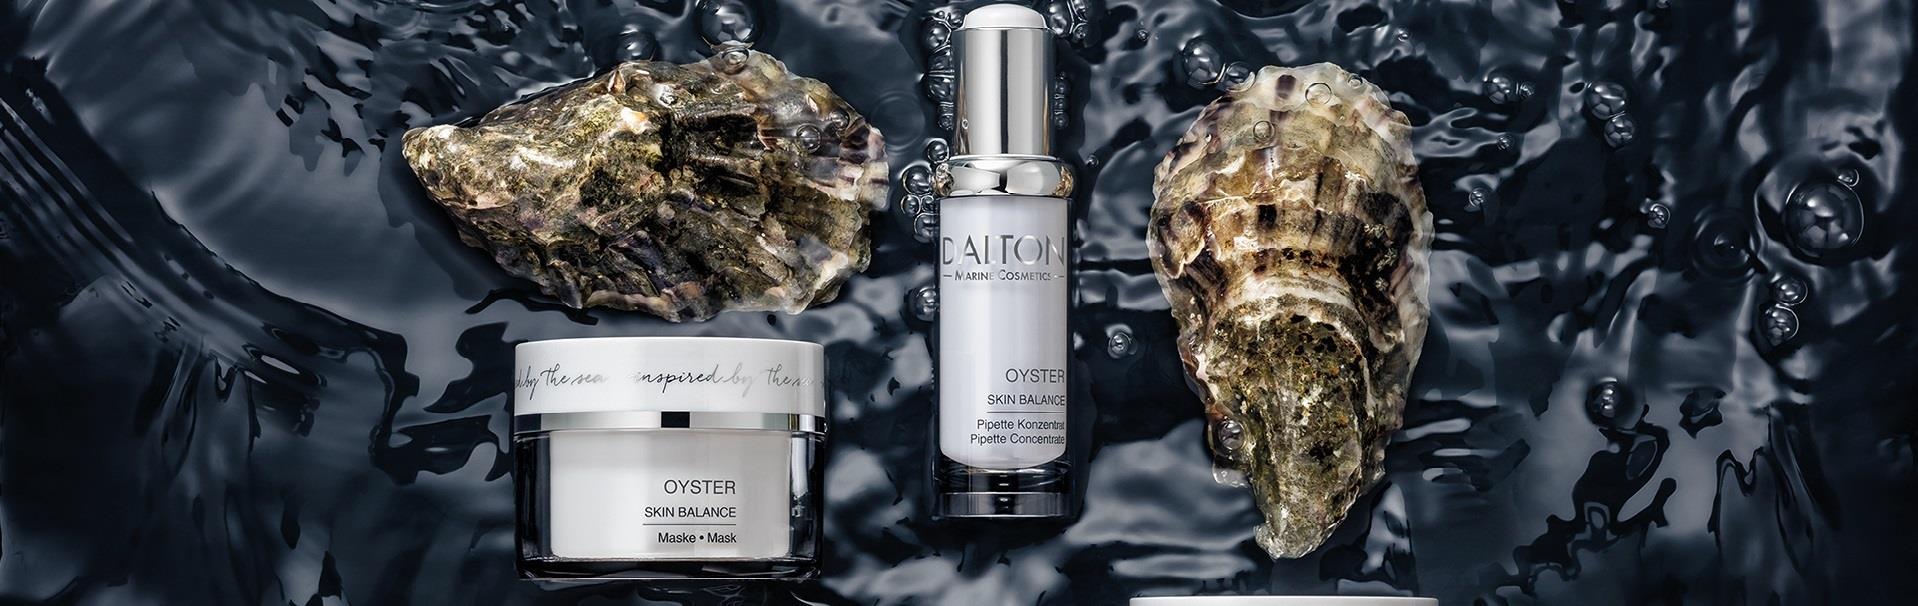 OYSTER • лечебная сила устриц